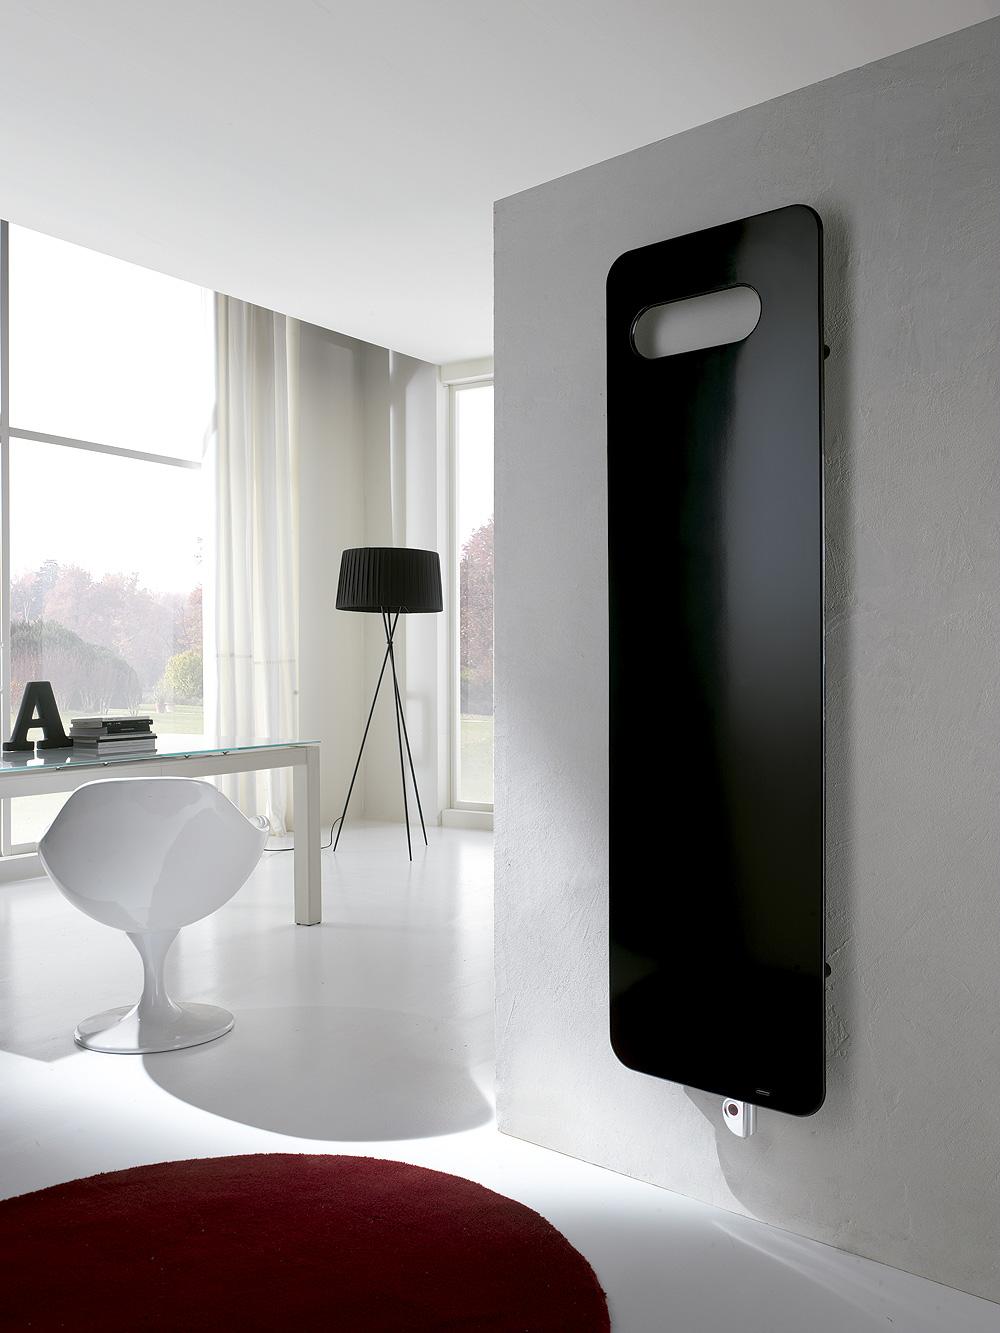 radiadores extra slim baxi design by cordivari (3)